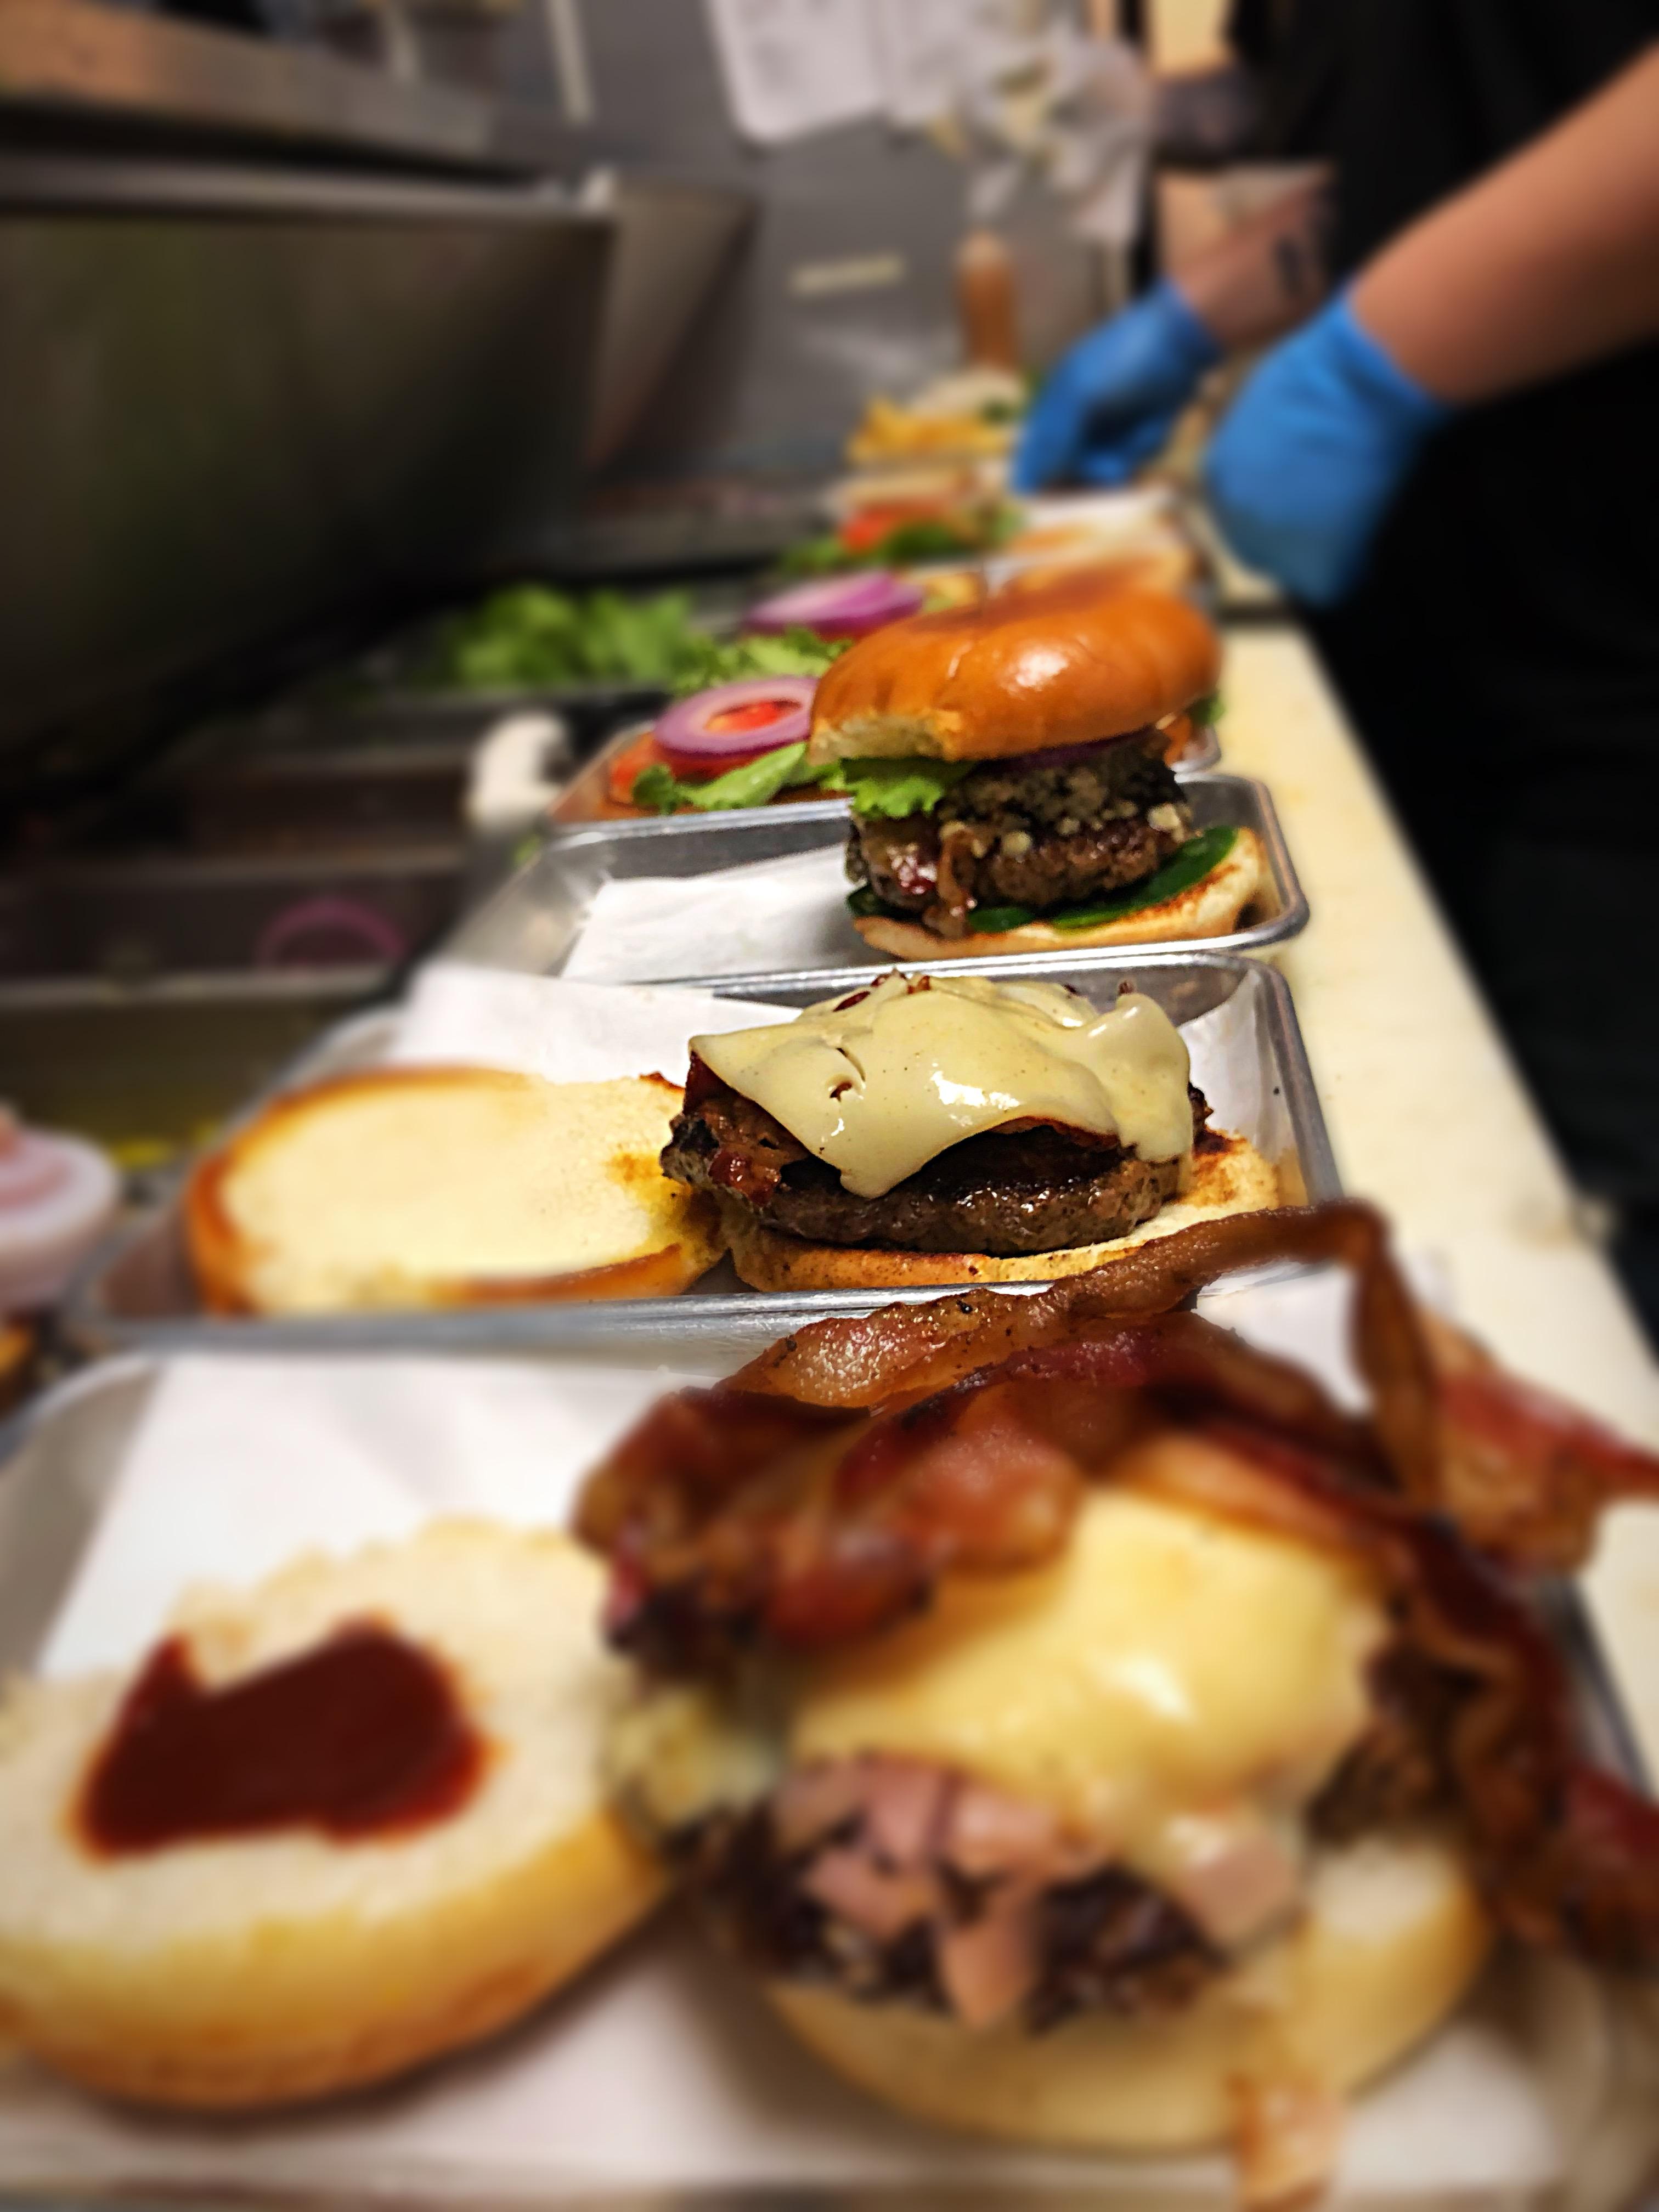 Comment Ranger Ma Cuisine oscar's breakfast, burgers & brews